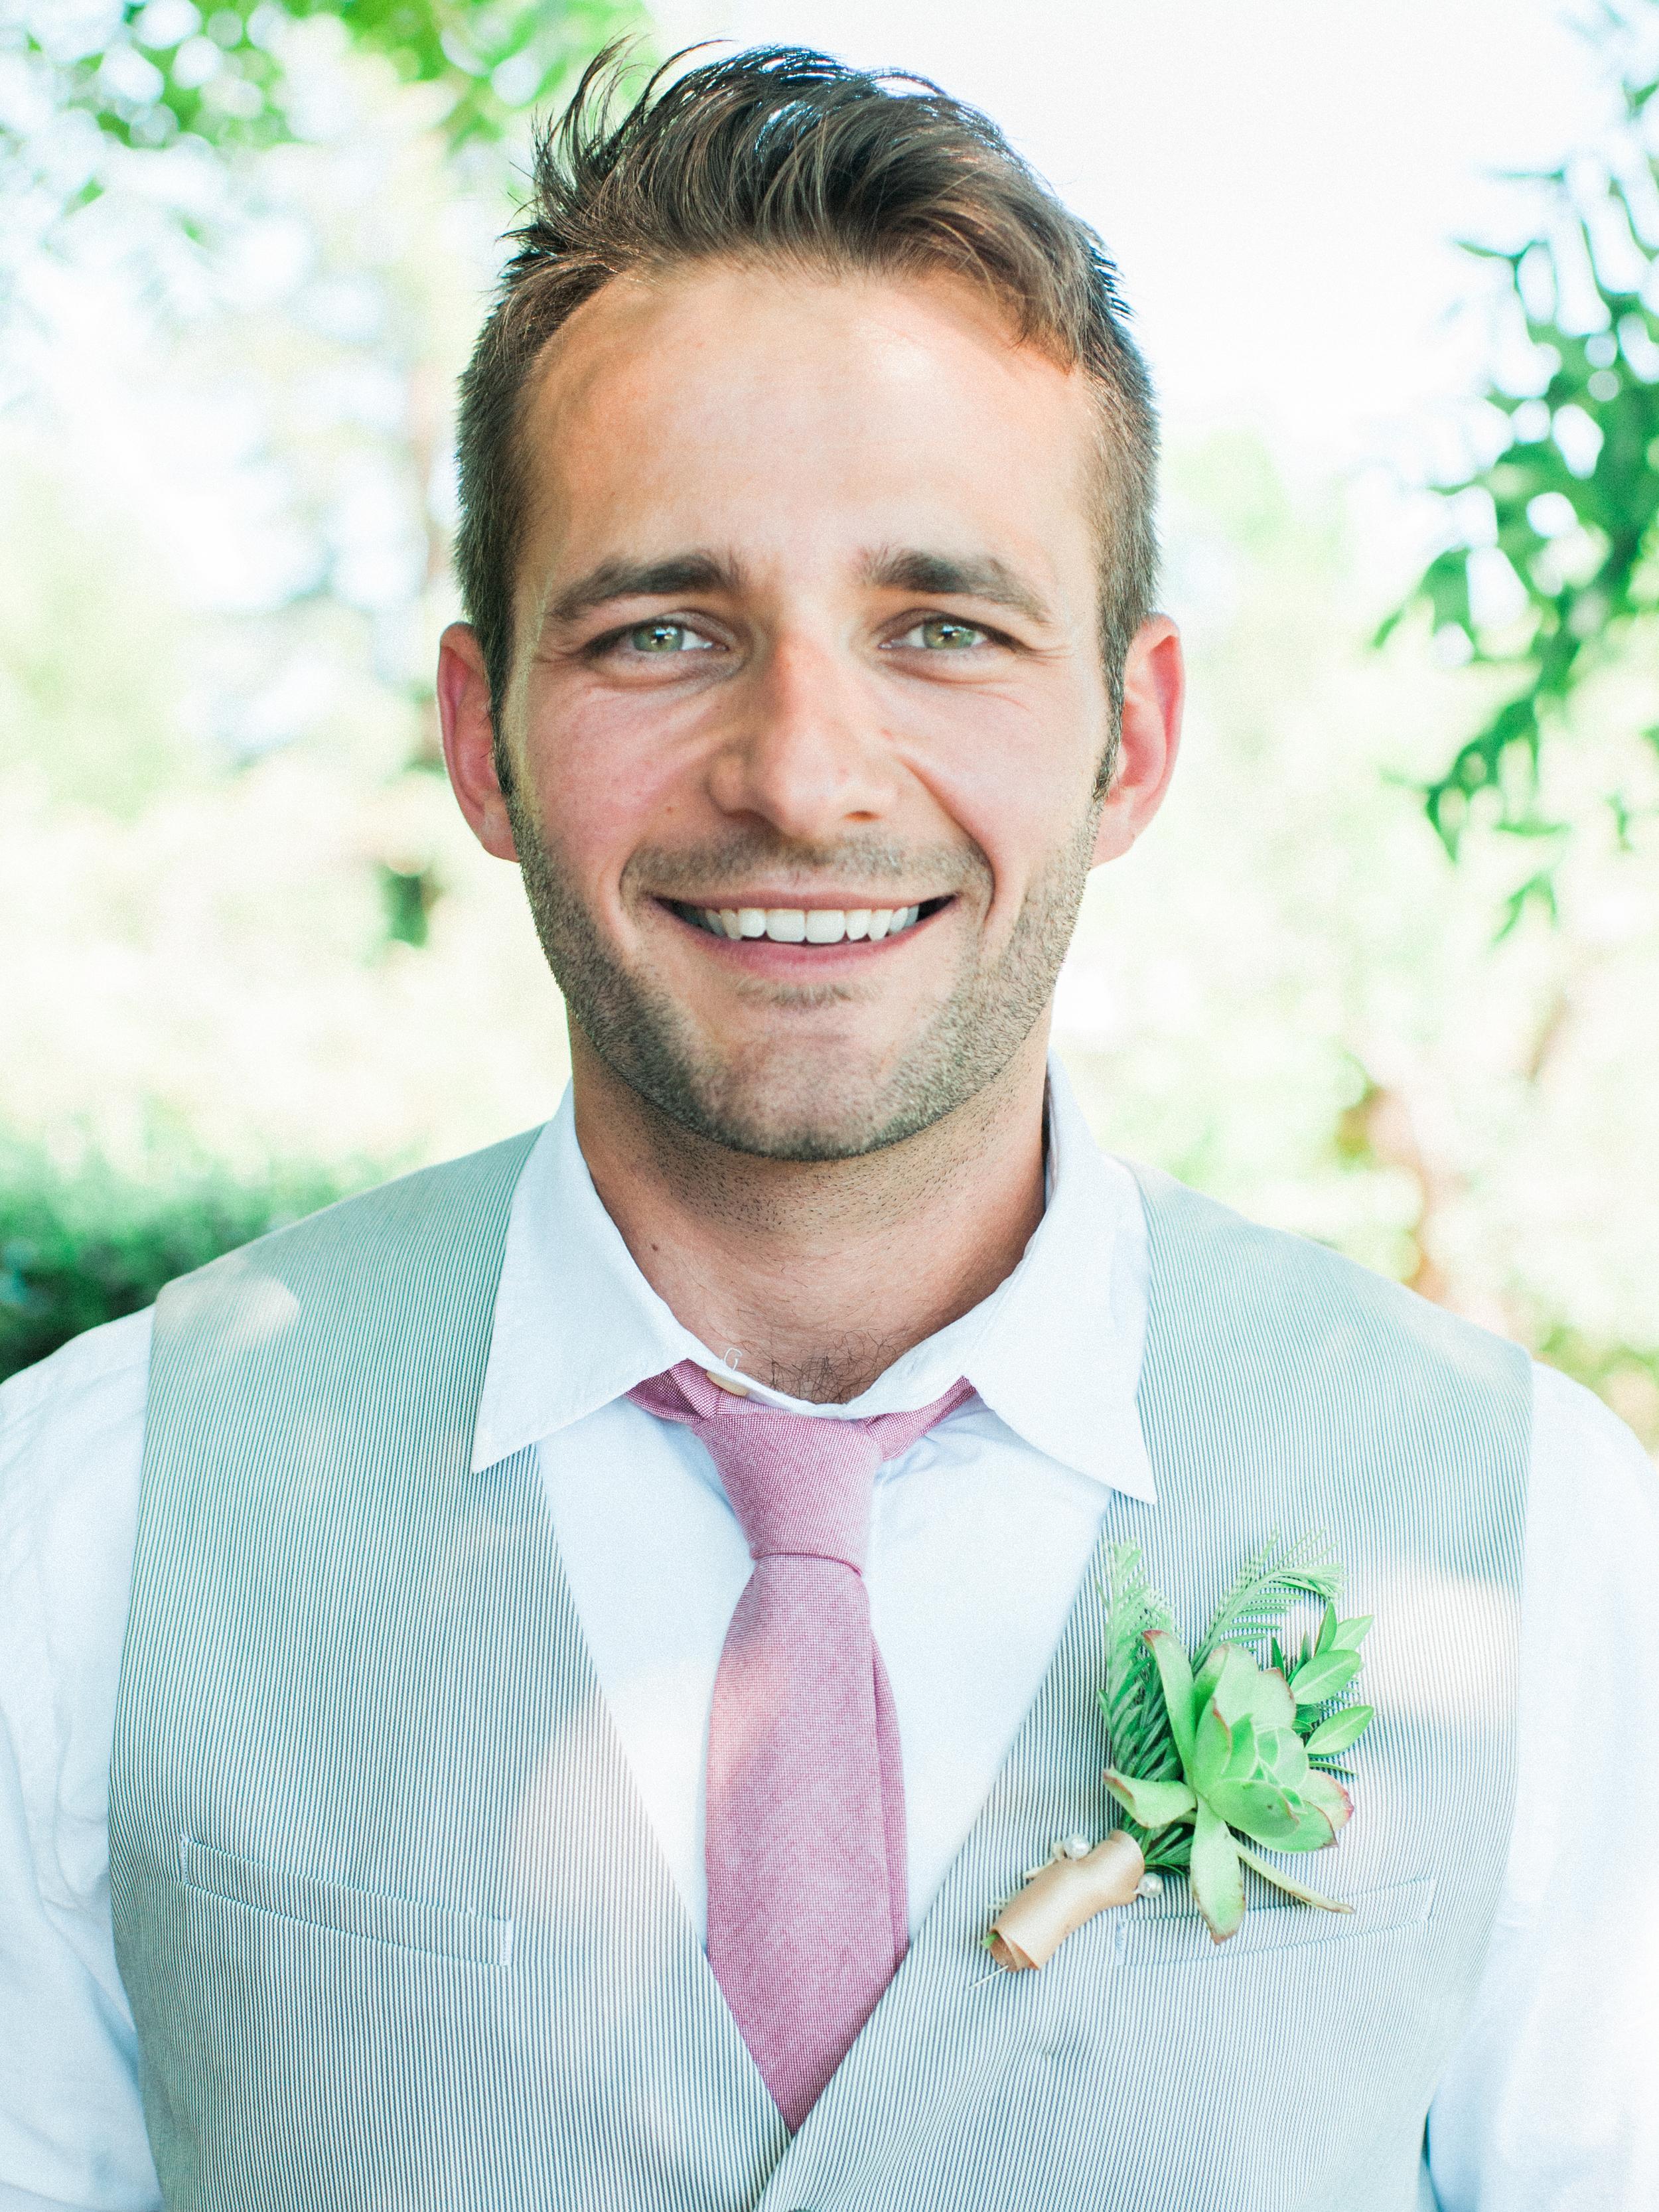 Anders Wedding by Jessica Garmon-074.JPG